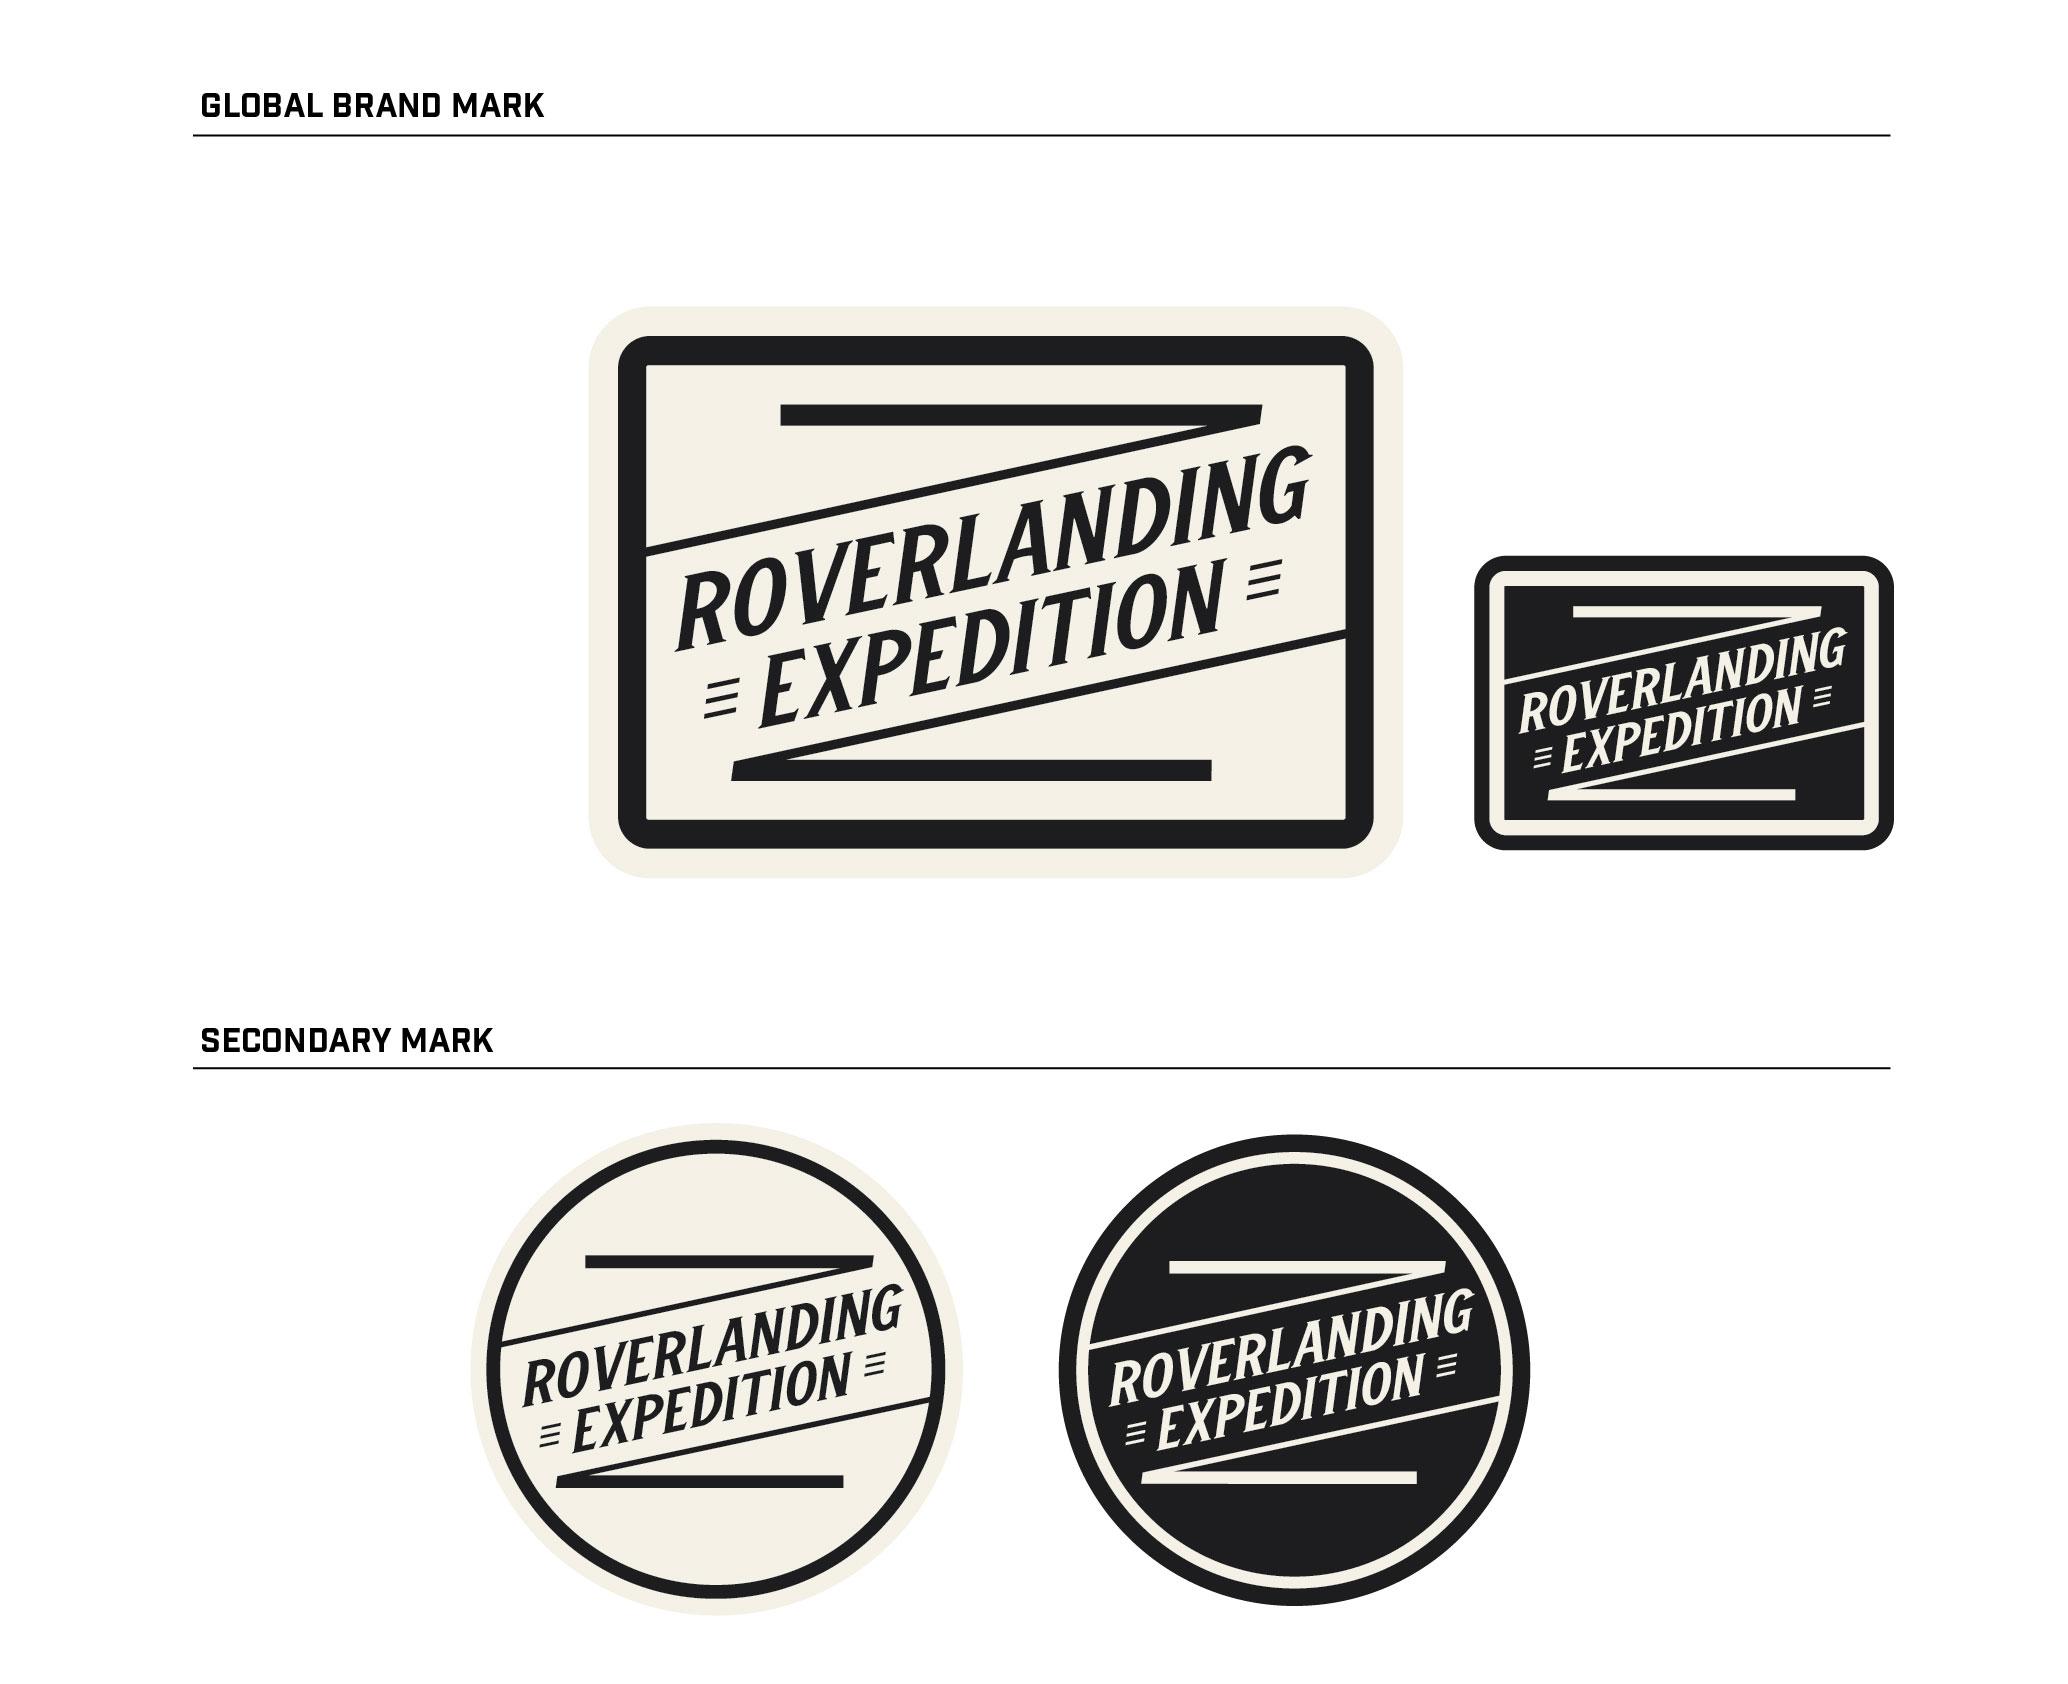 RoverlandingExpedition_Globalbrand-03-04.jpg